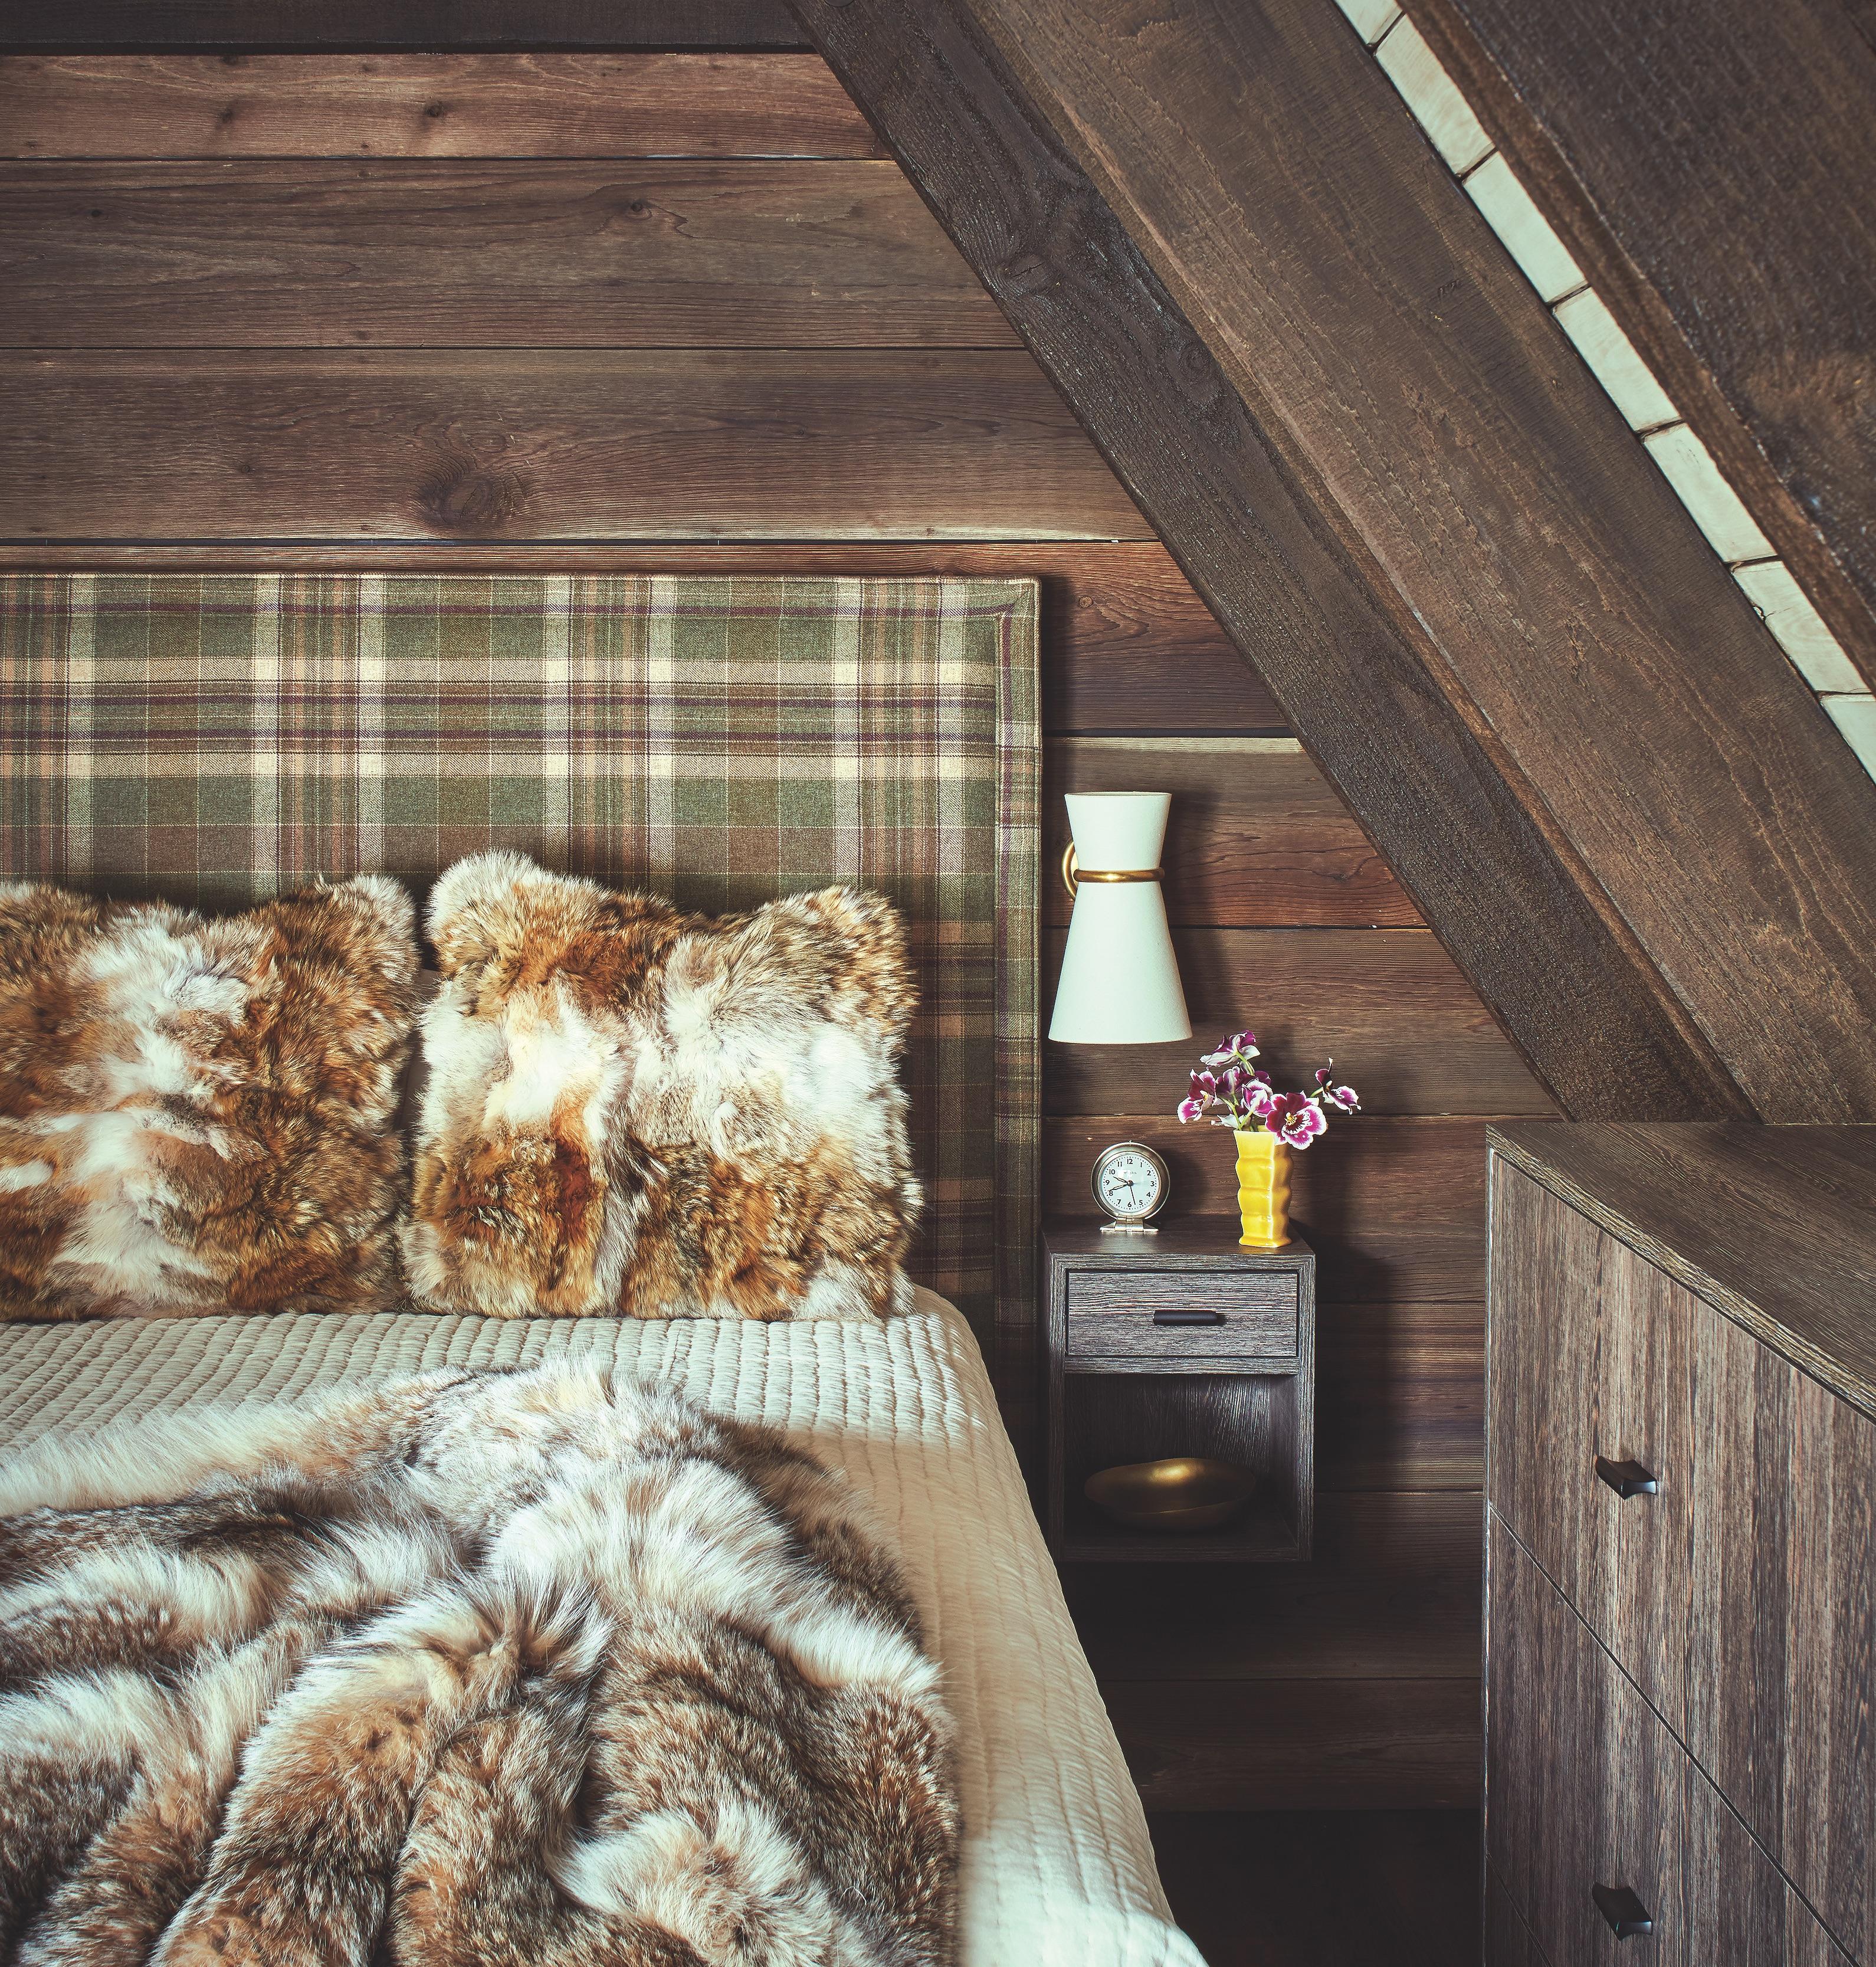 Boathouse Bed